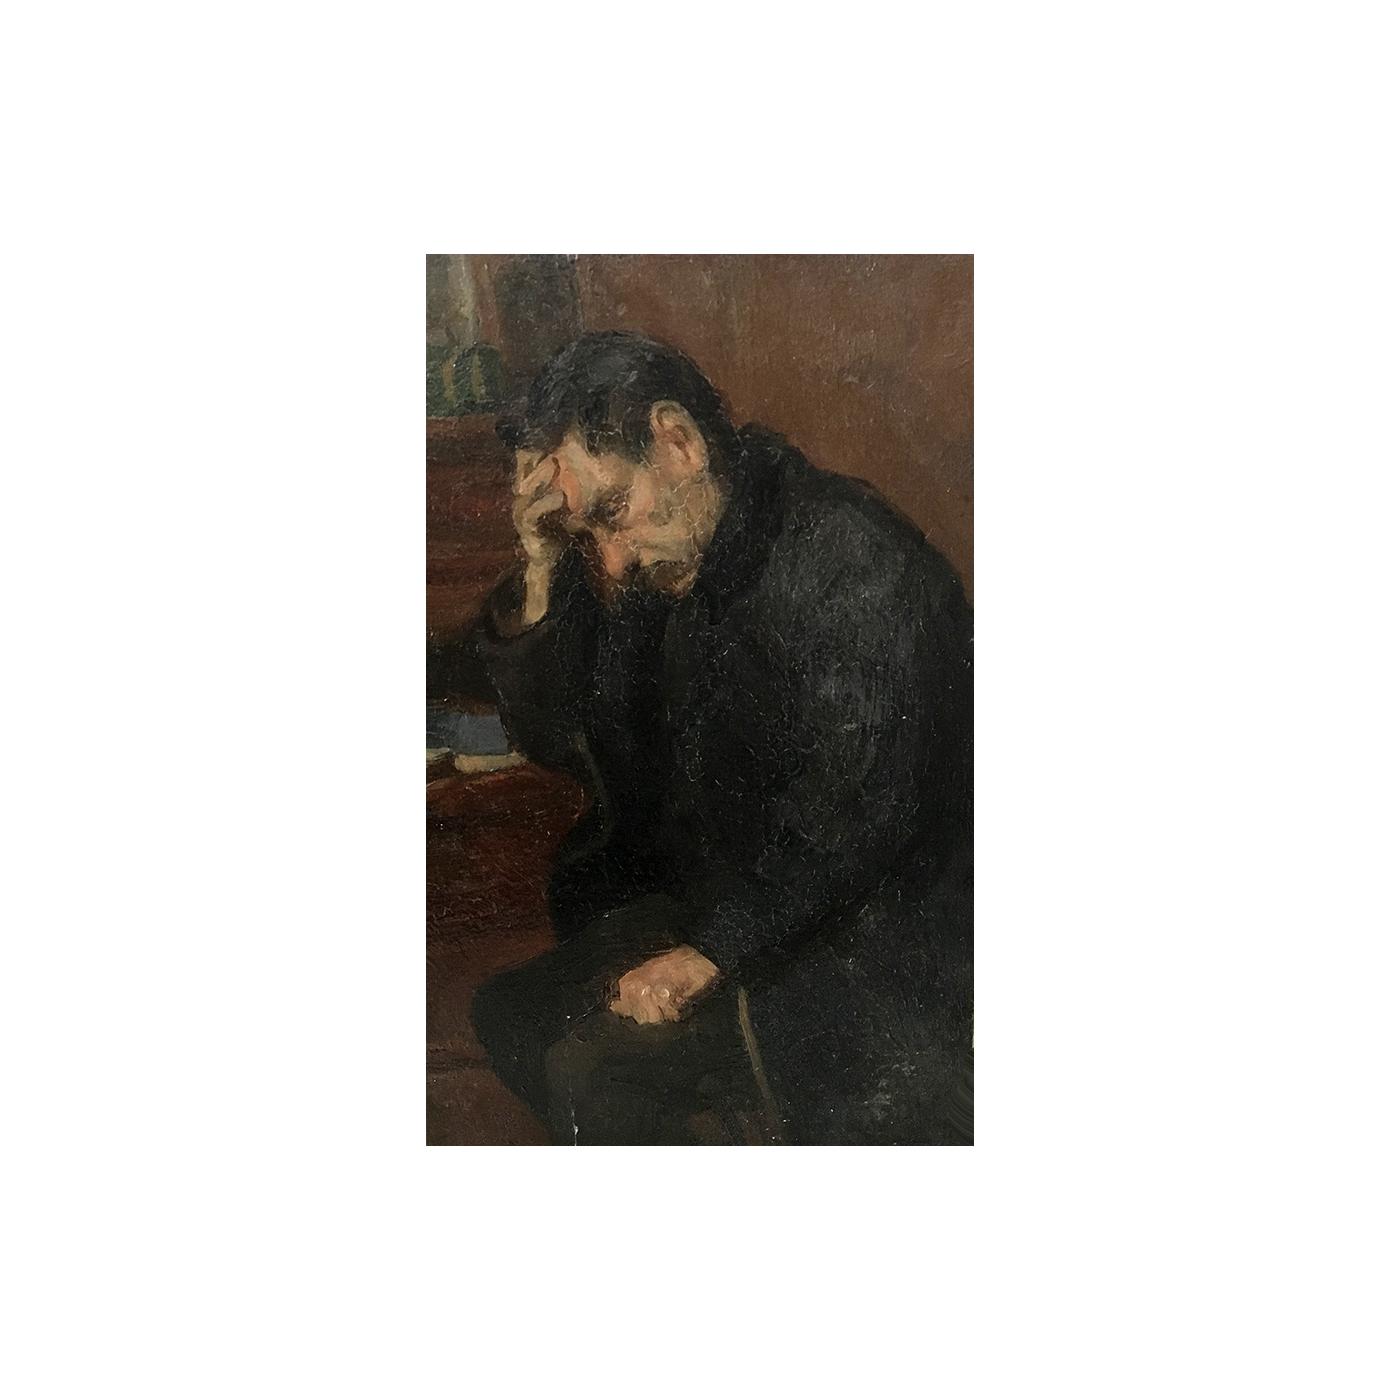 "Telemaco Signorini (1835 - 1901) Italian painter ""Lost in Thoughts"" circa 1880's"